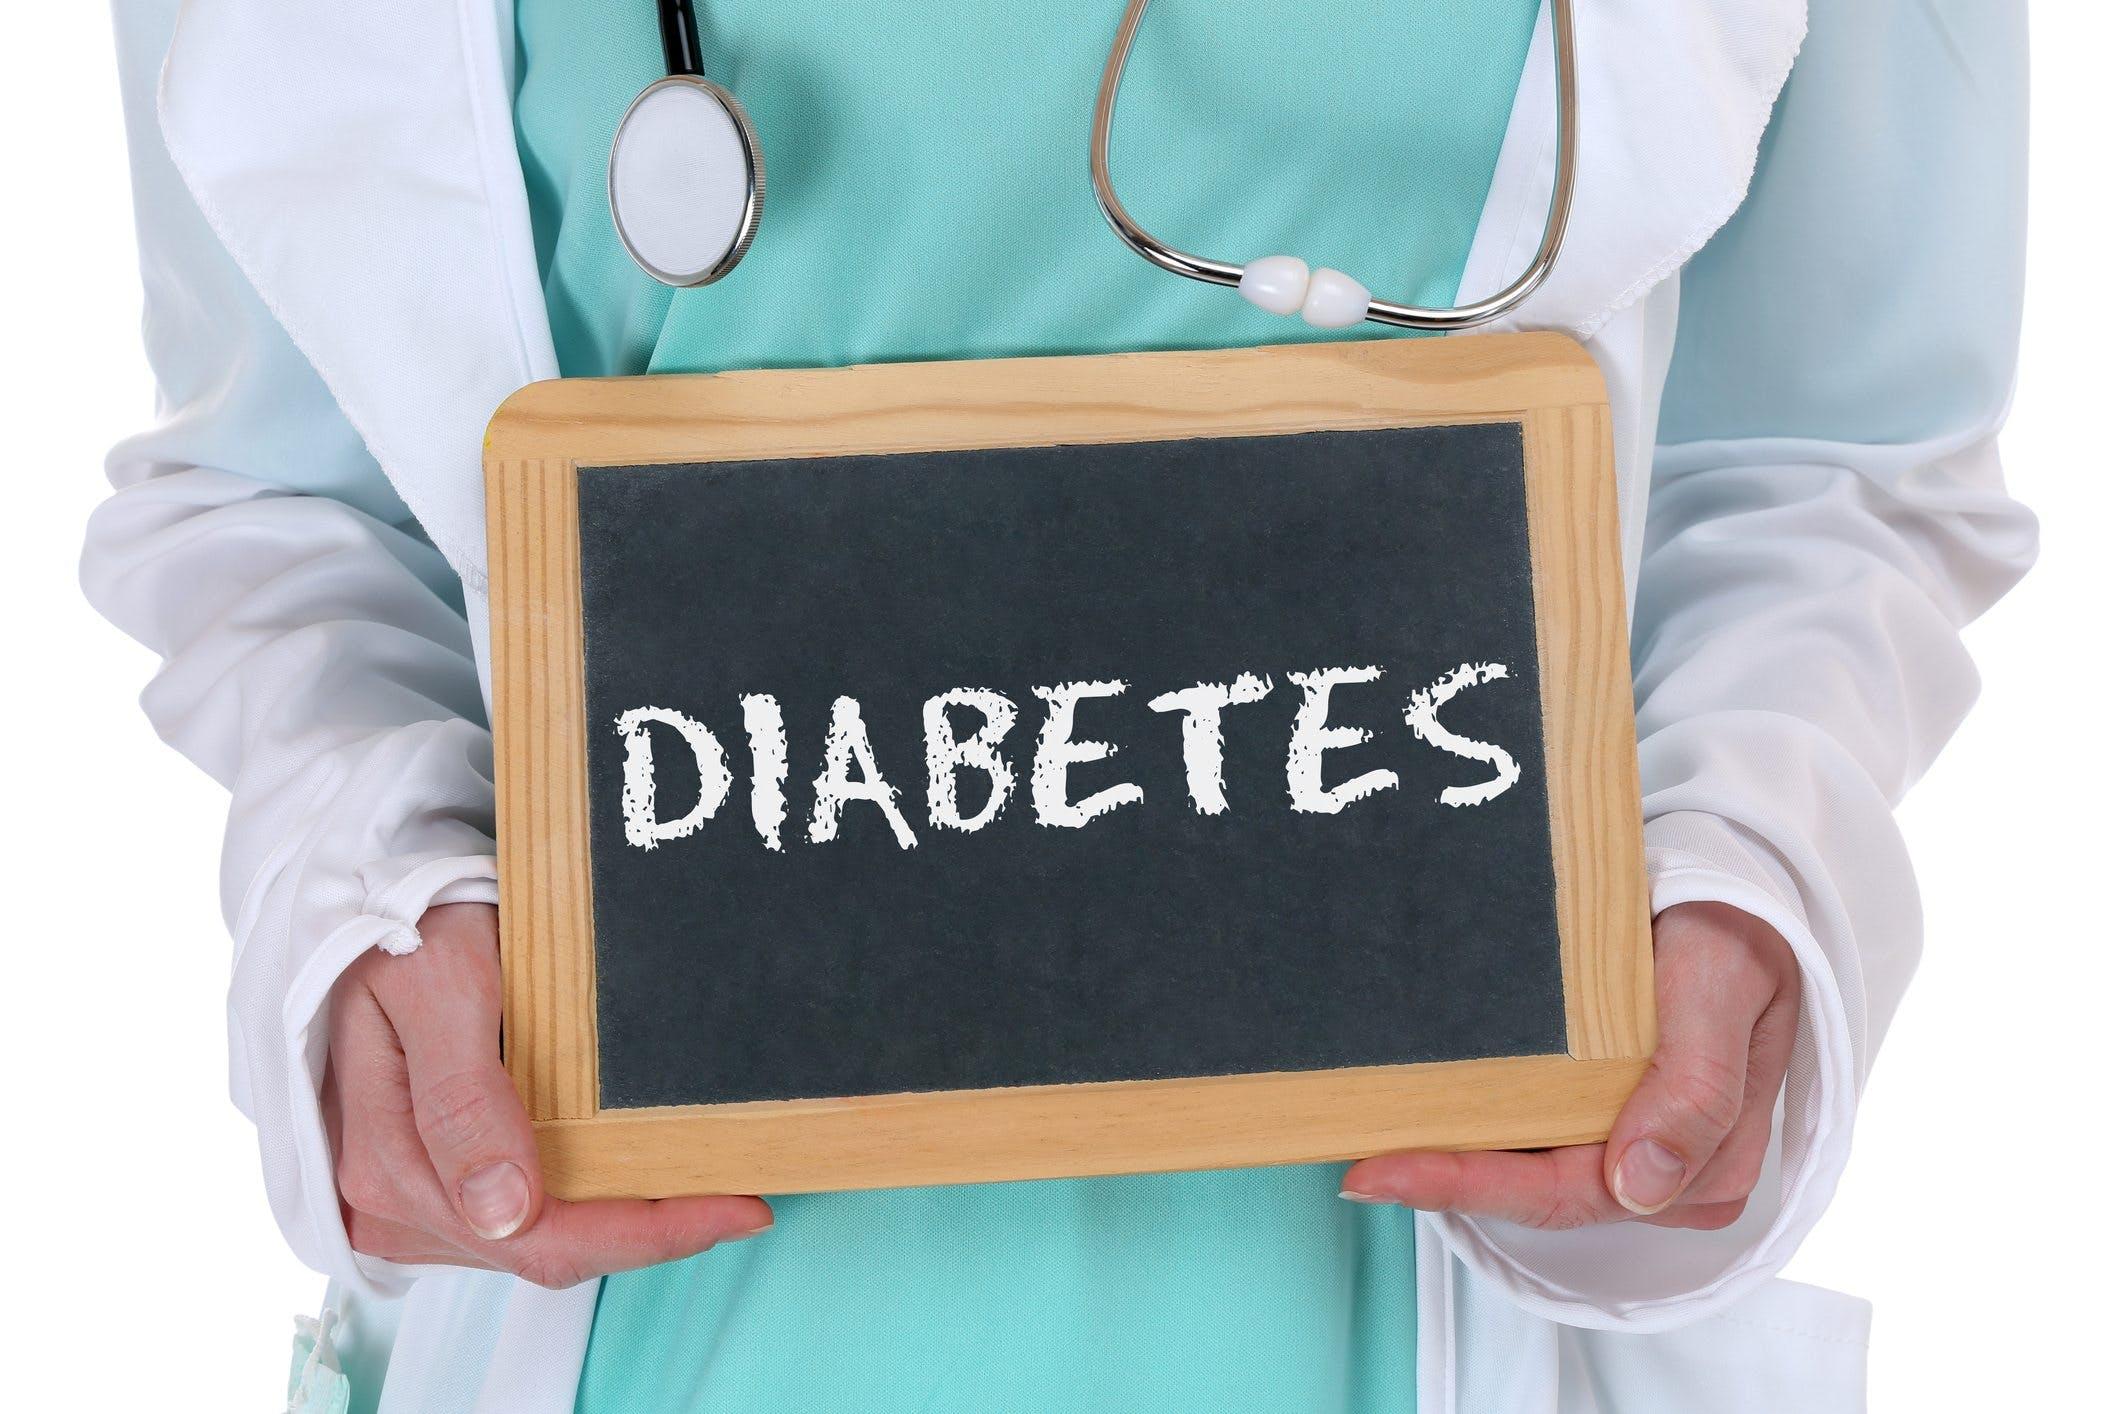 Diabetes sugar disease ill illness healthy health doctor